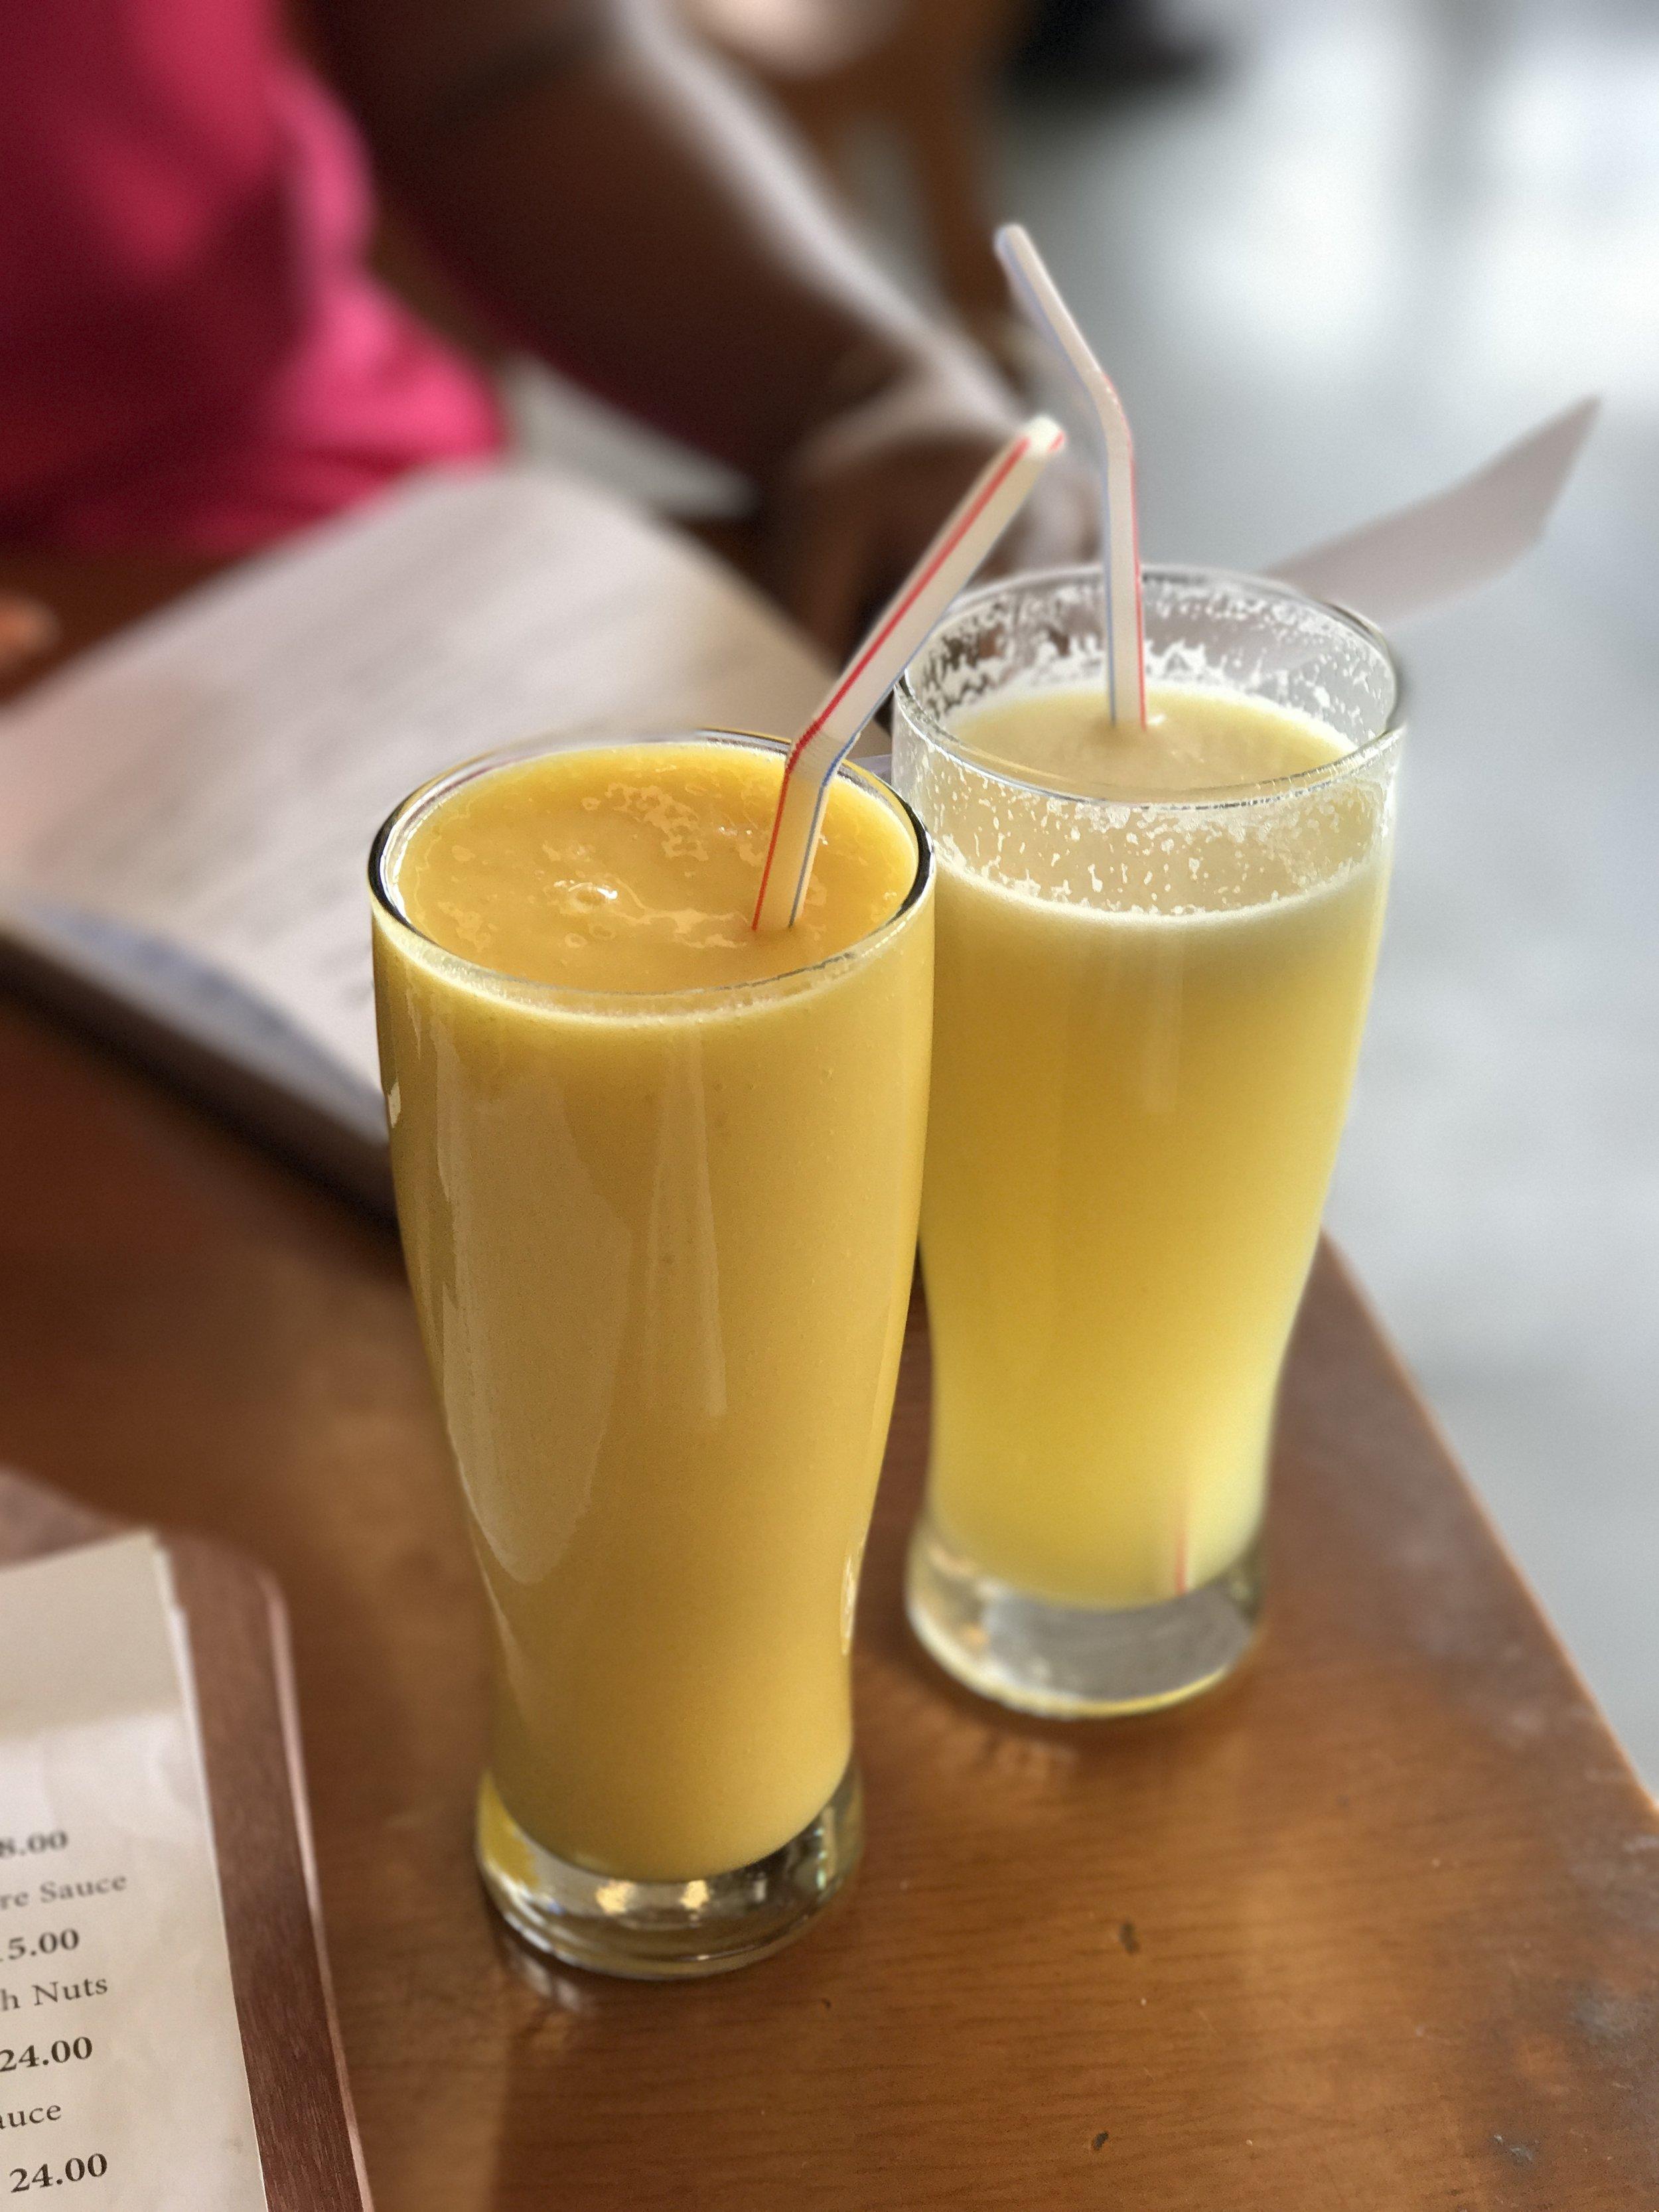 Mango and Pineapple juice and Pineapple and Orange juice